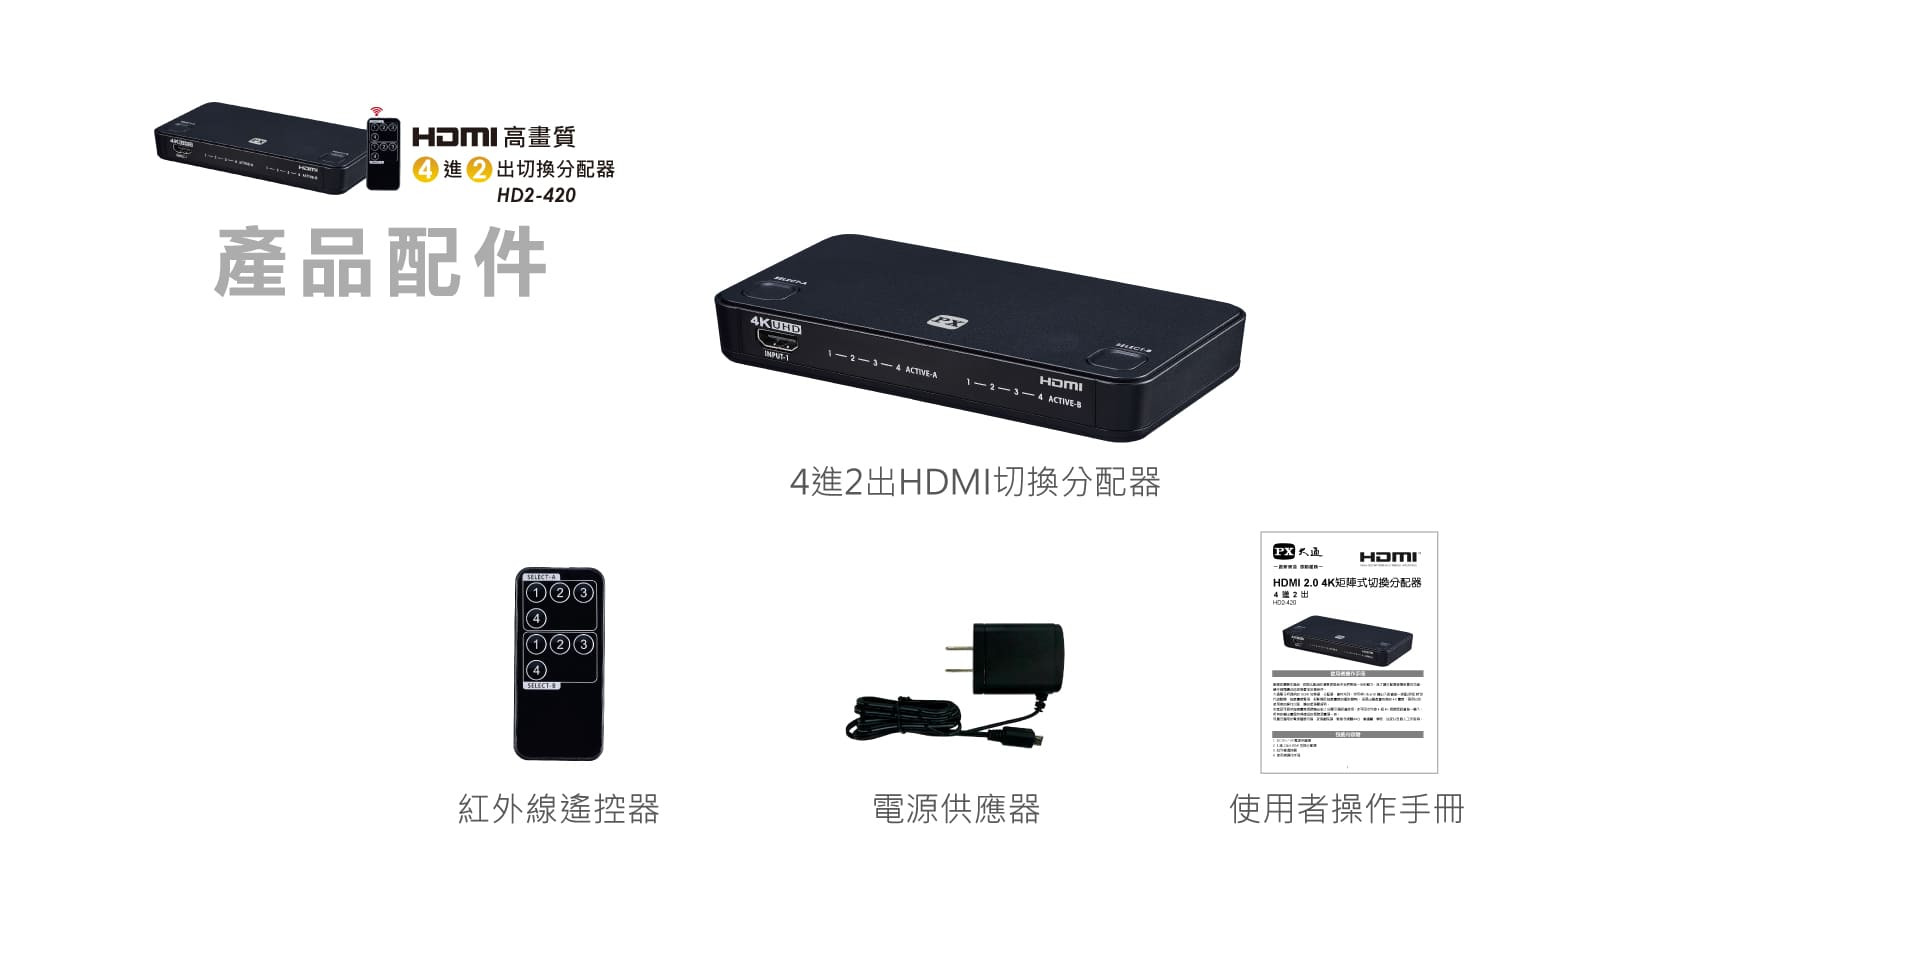 proimages/product/HDMI/HD2-420/HD2-420_07.jpg